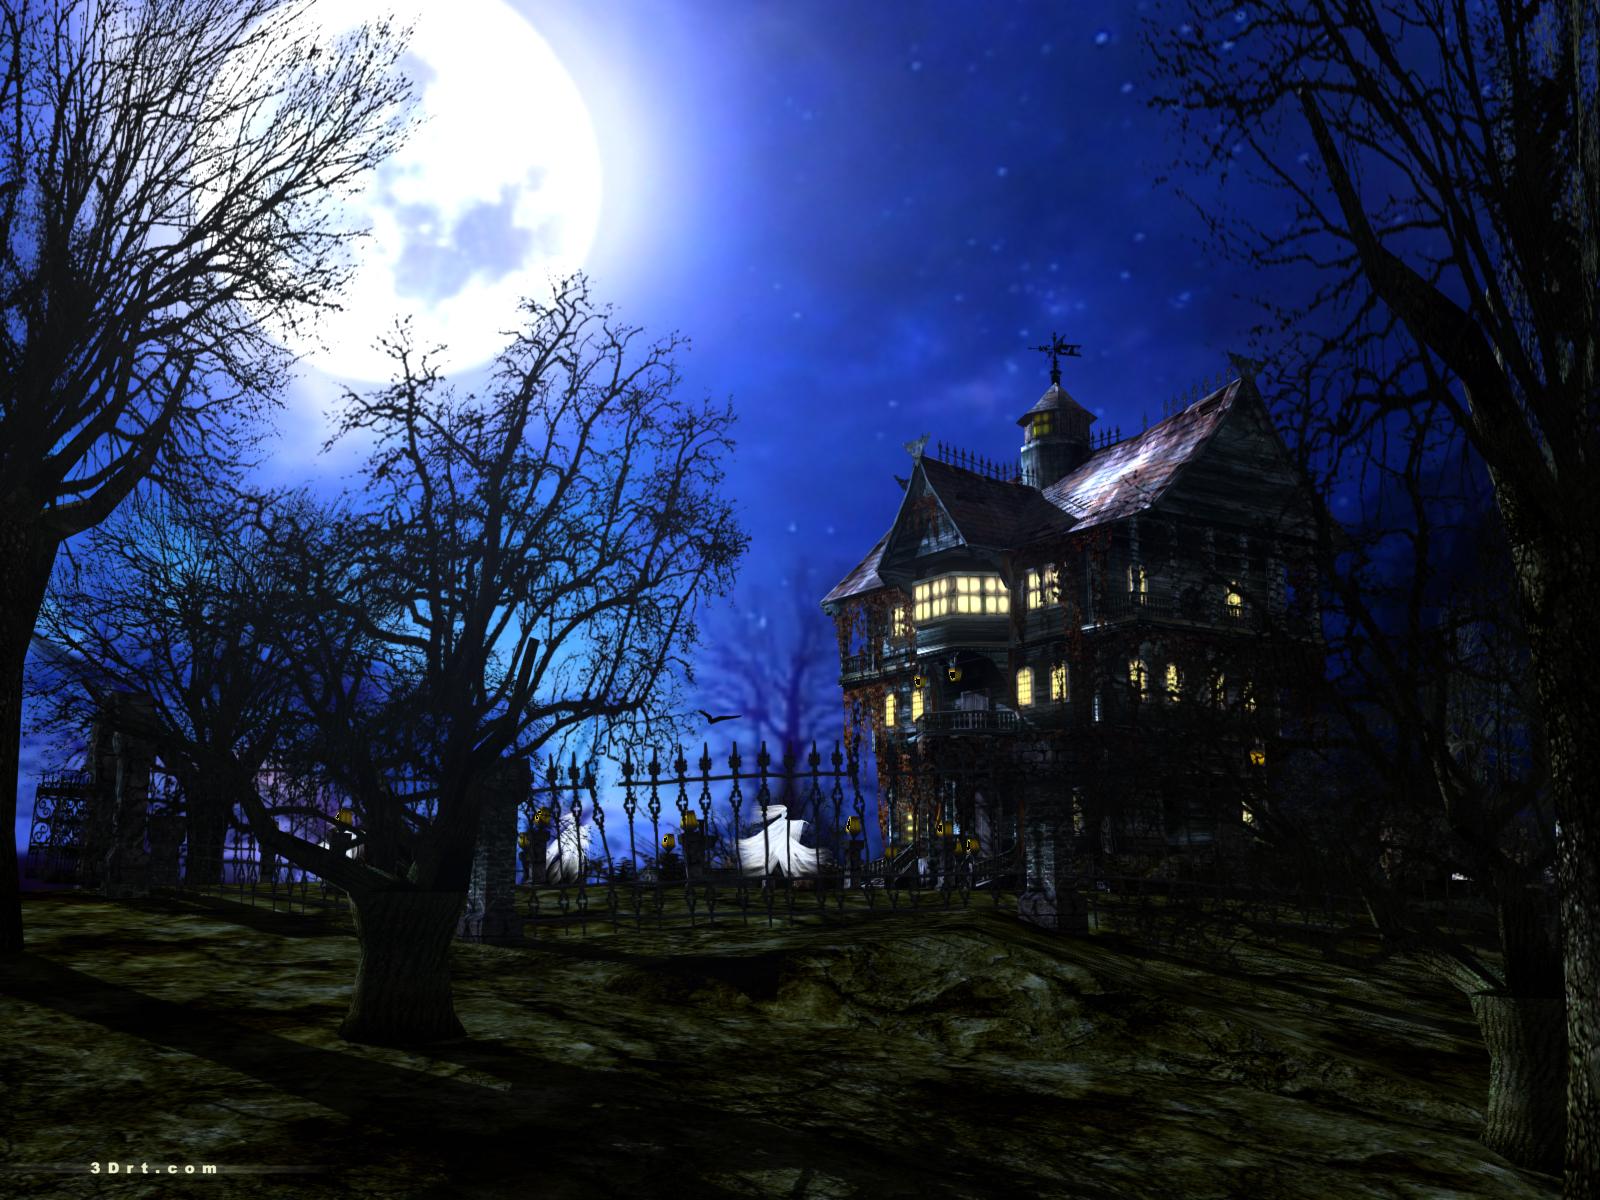 Wallpaper Home Photos Of Dark Forest Mansion Screensaver